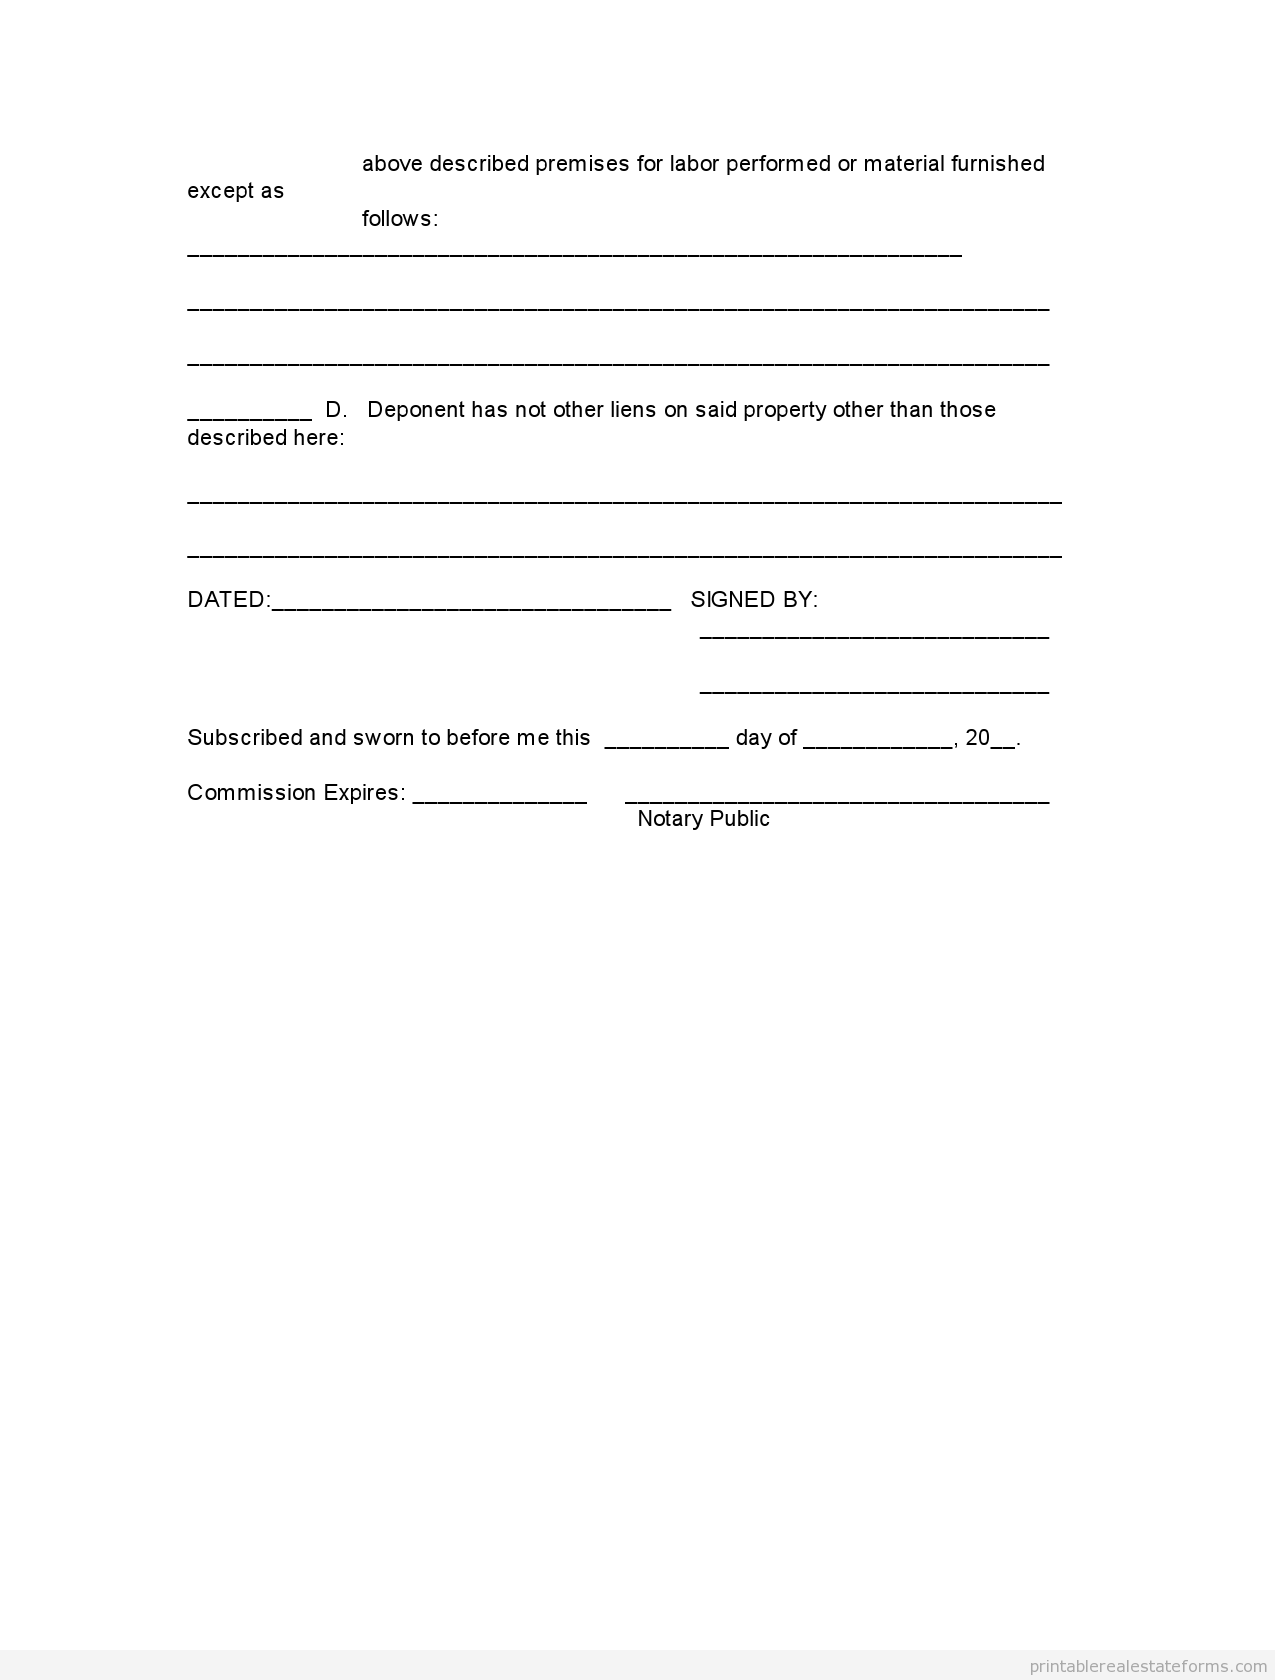 Blank Word Affidavit Template